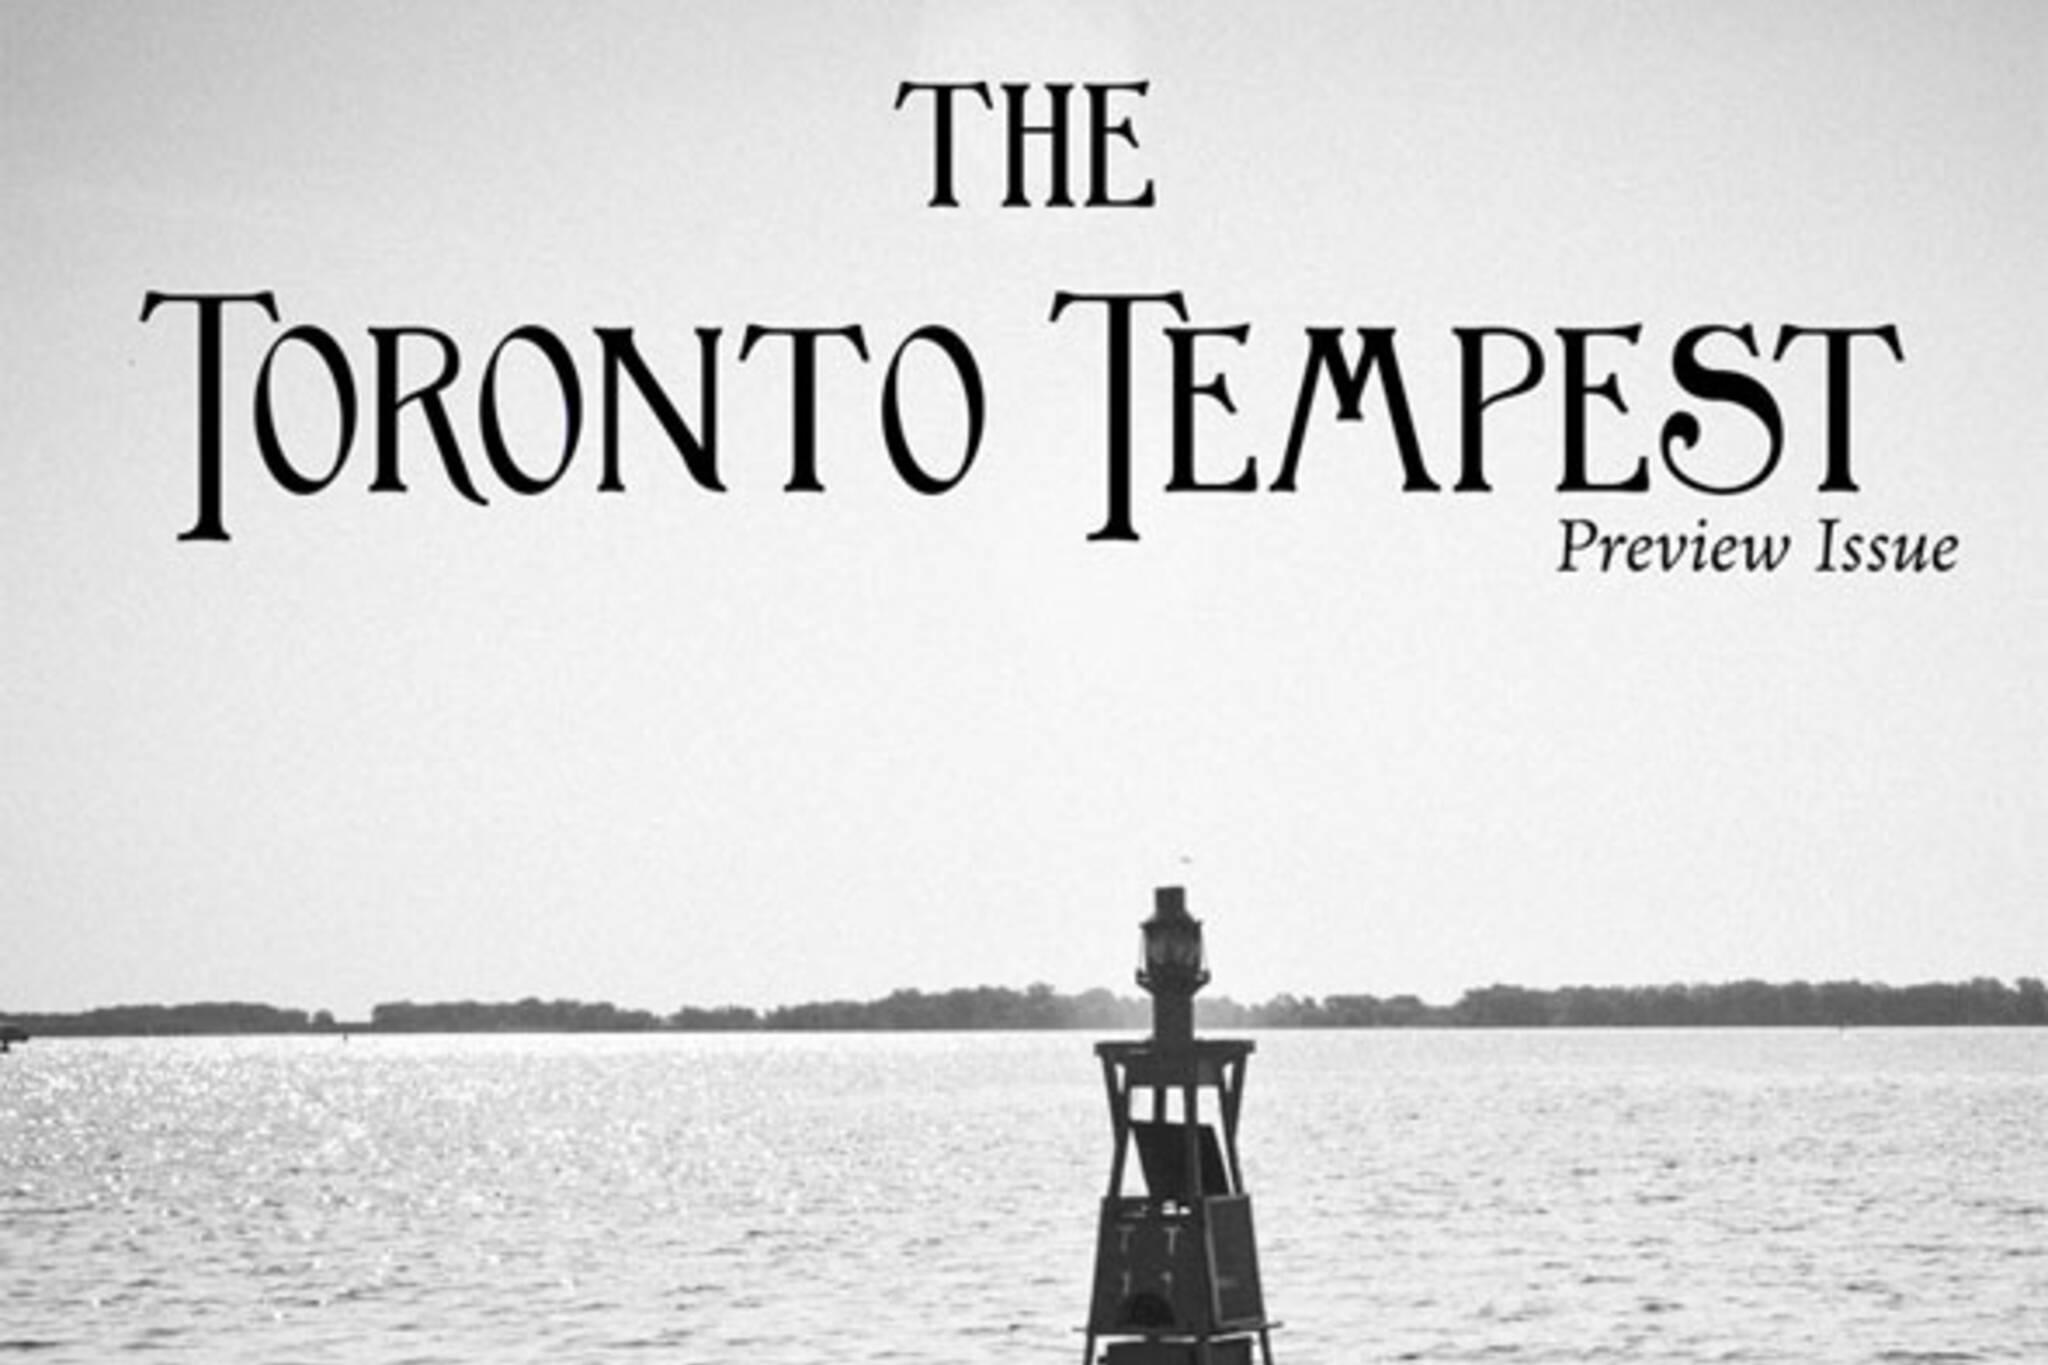 Toronto Tempest